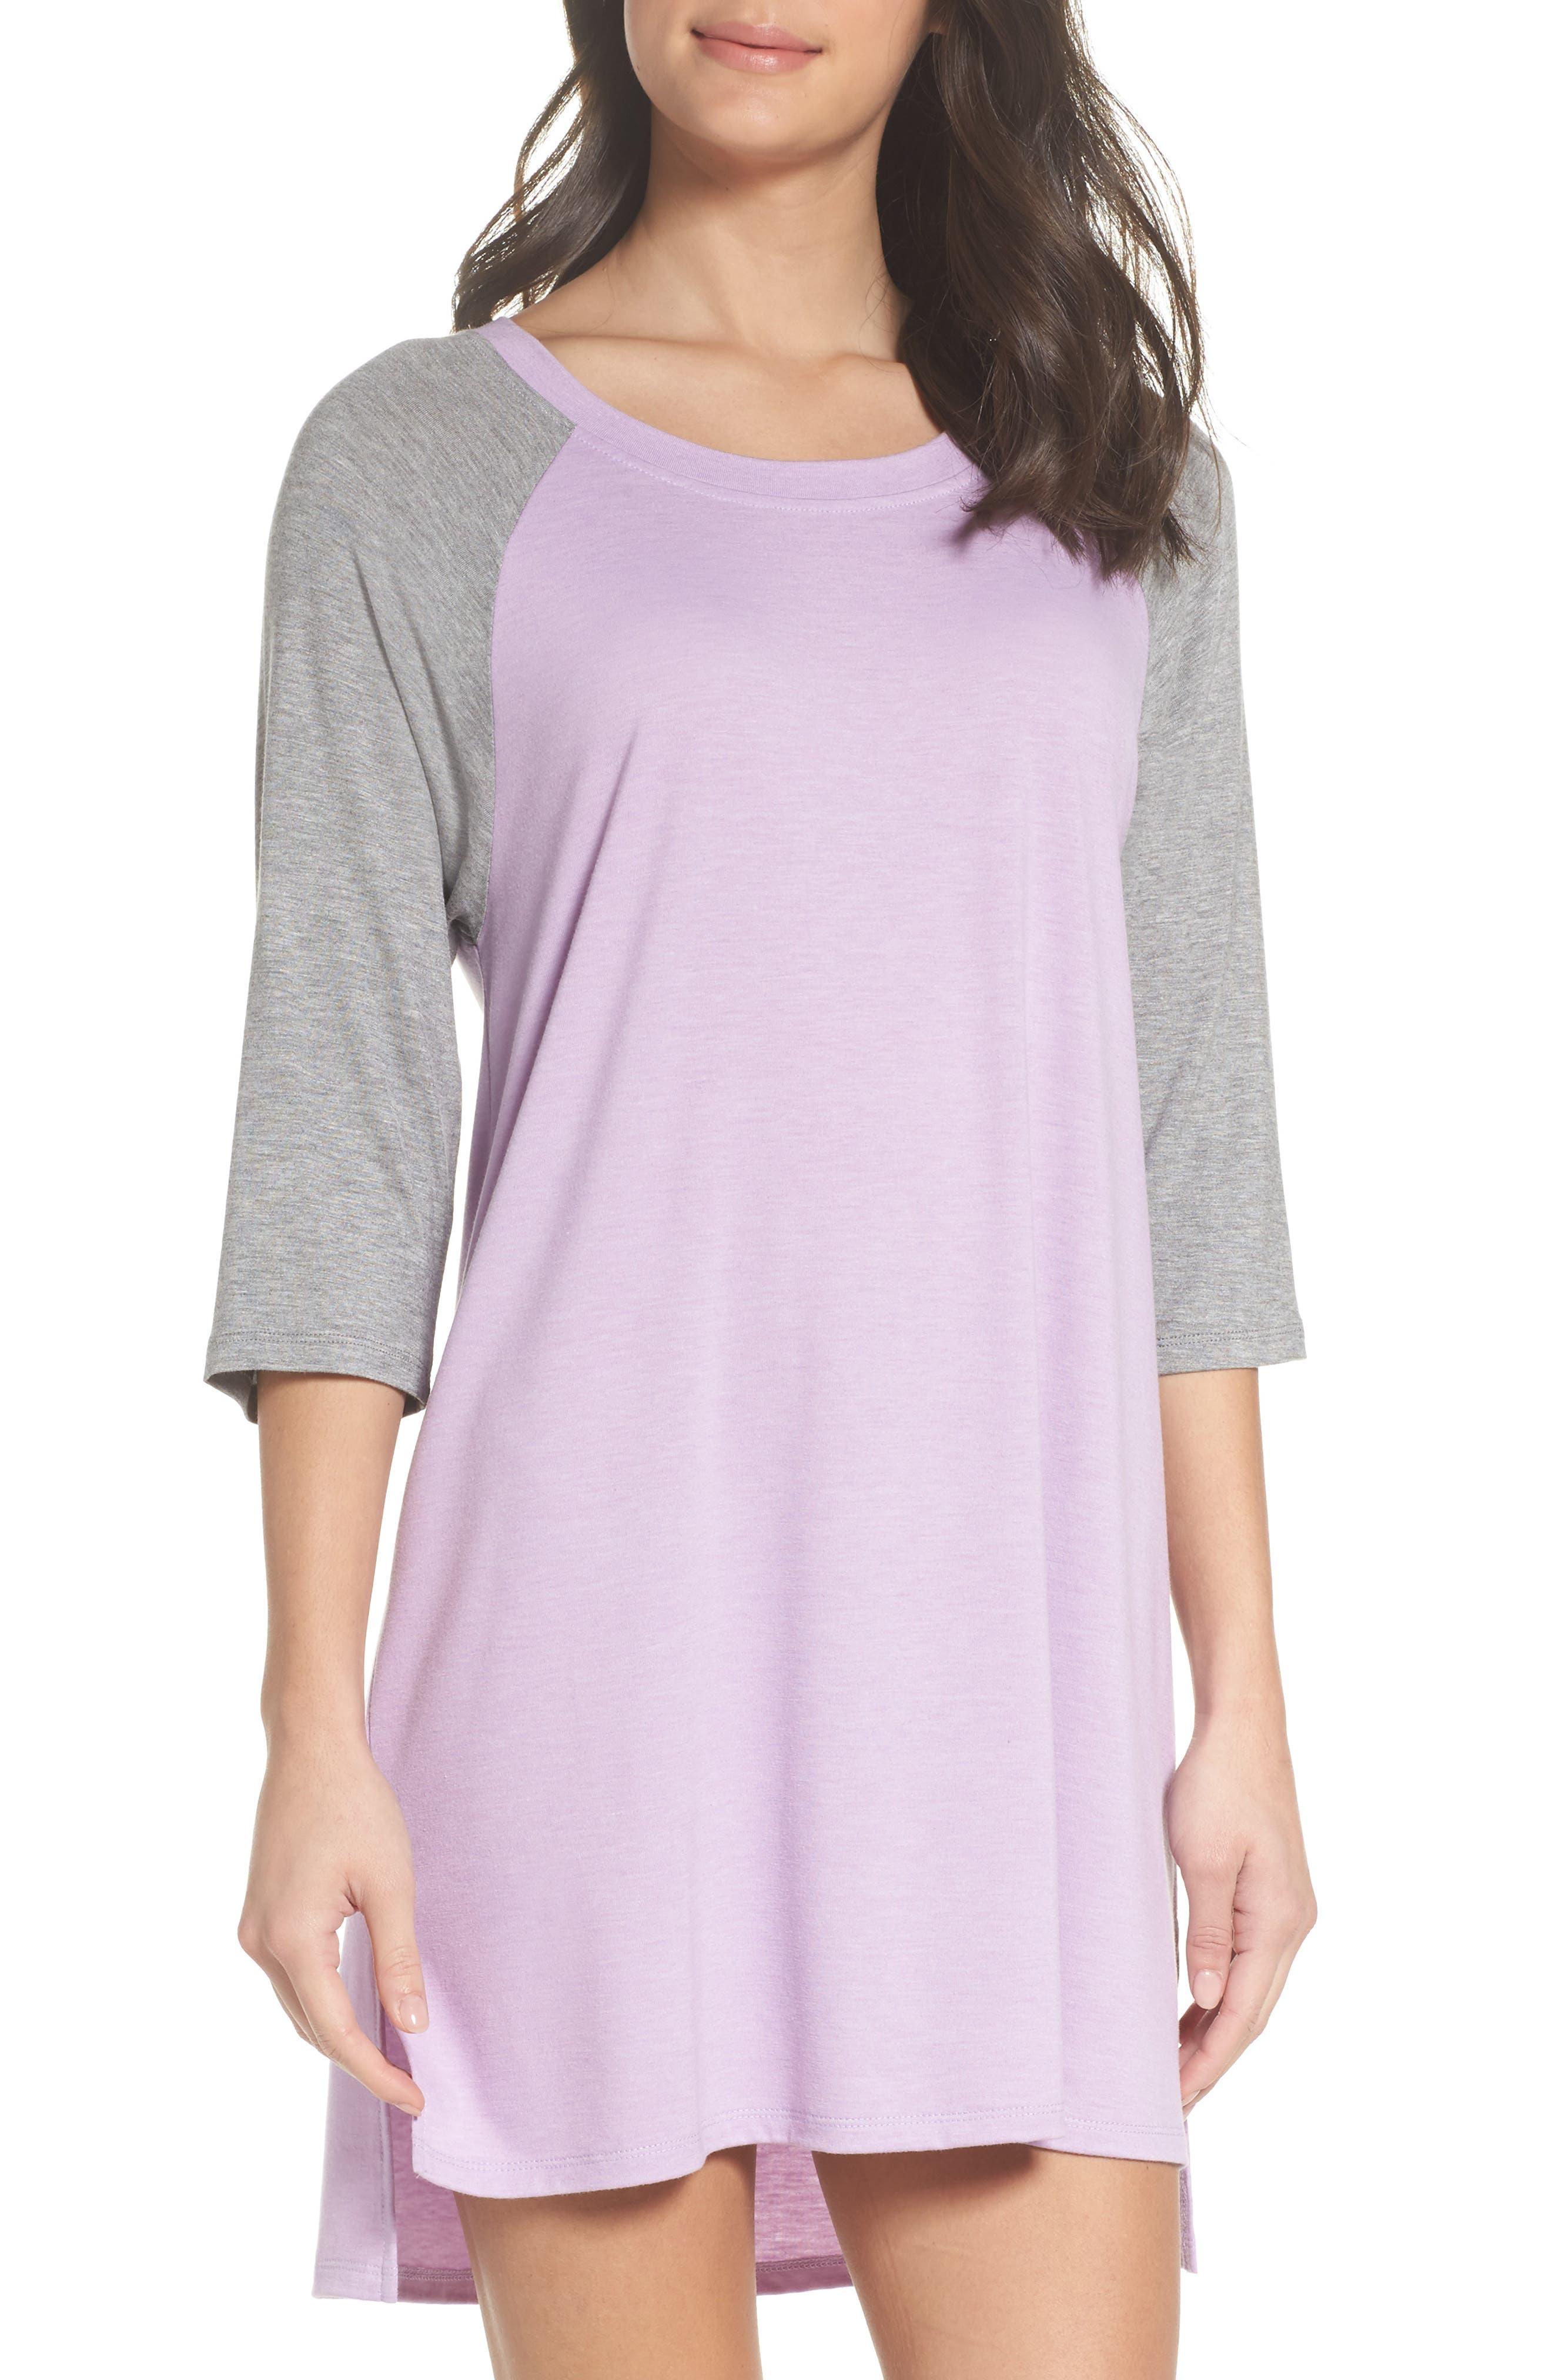 Honeydew All American Sleep Shirt,                             Main thumbnail 6, color,